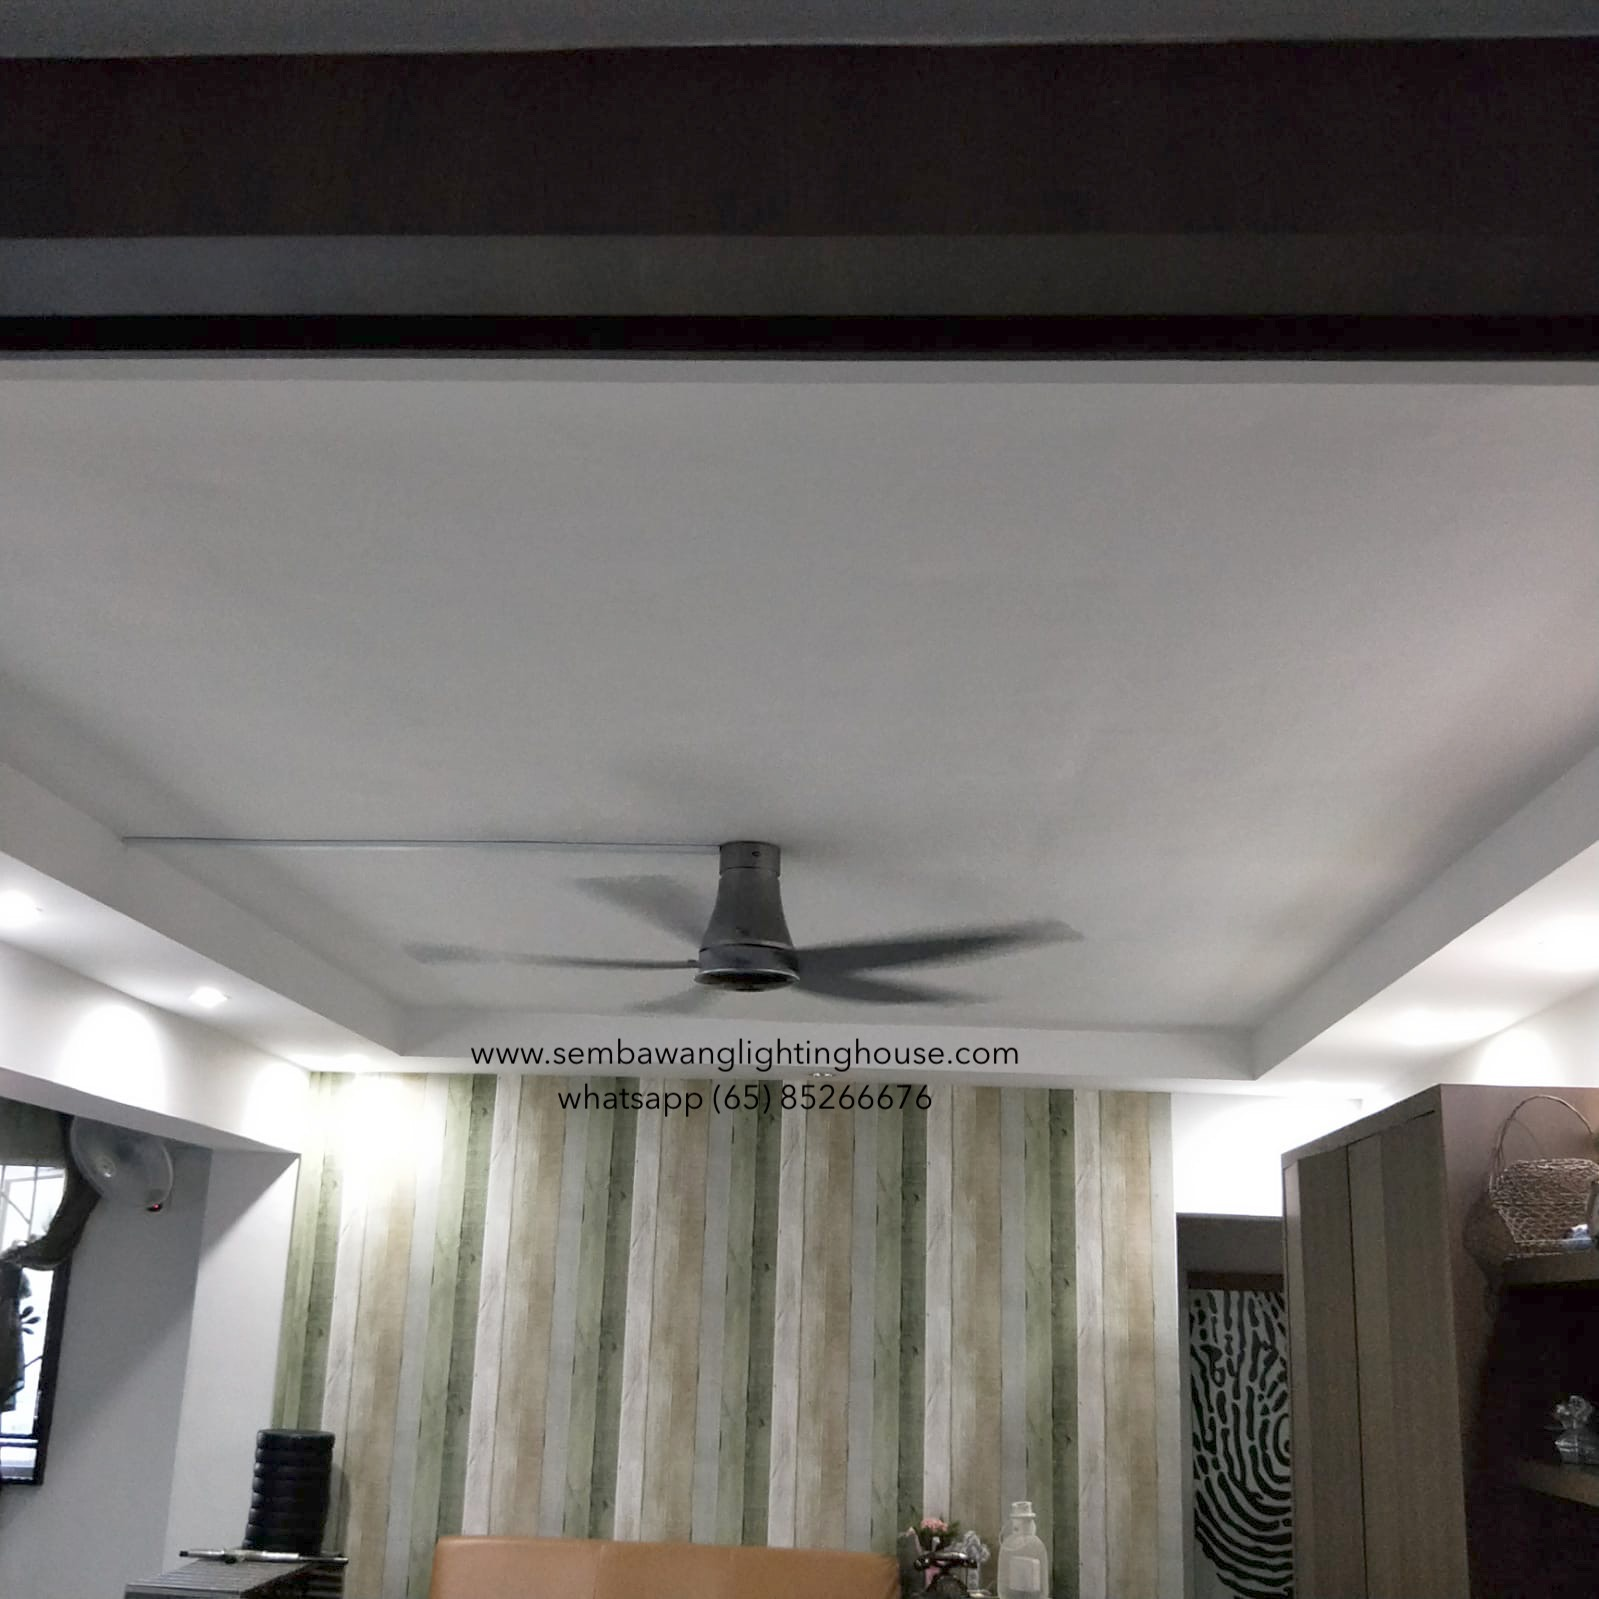 kdk-t60aw-ceiling-fan-without-light-sembawang-lighting-house-sample-09.jpg